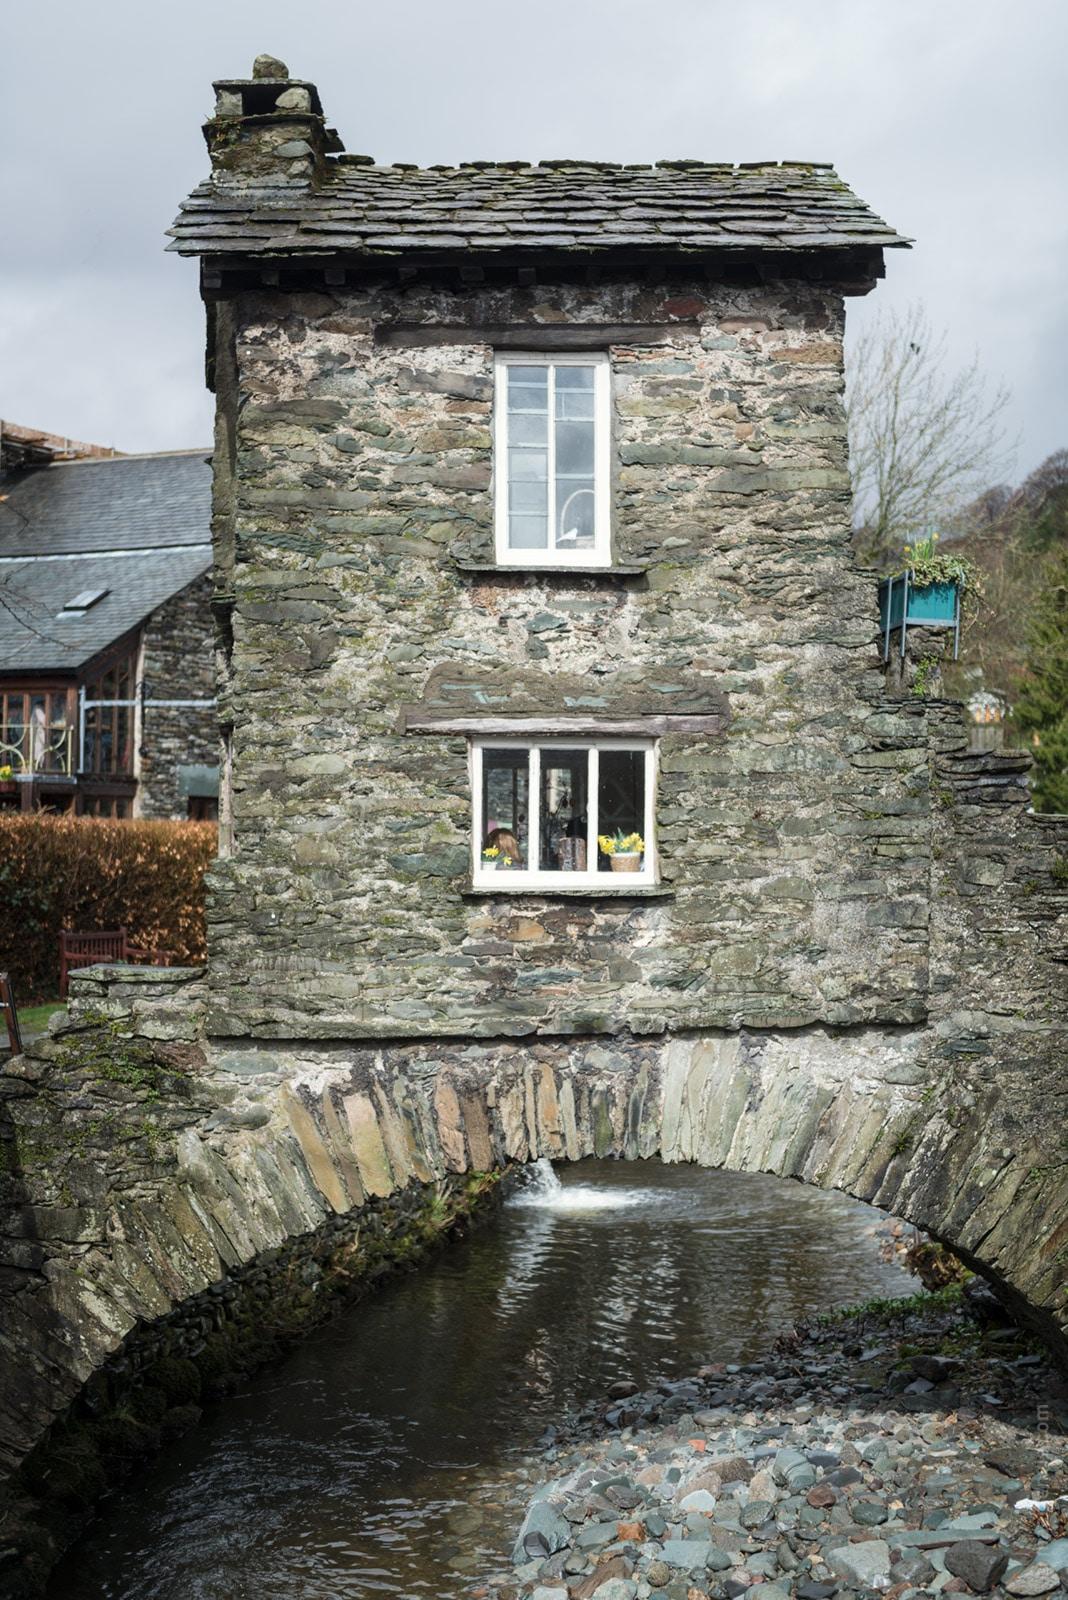 20160327 20160327 8718 - Lake District Impressions